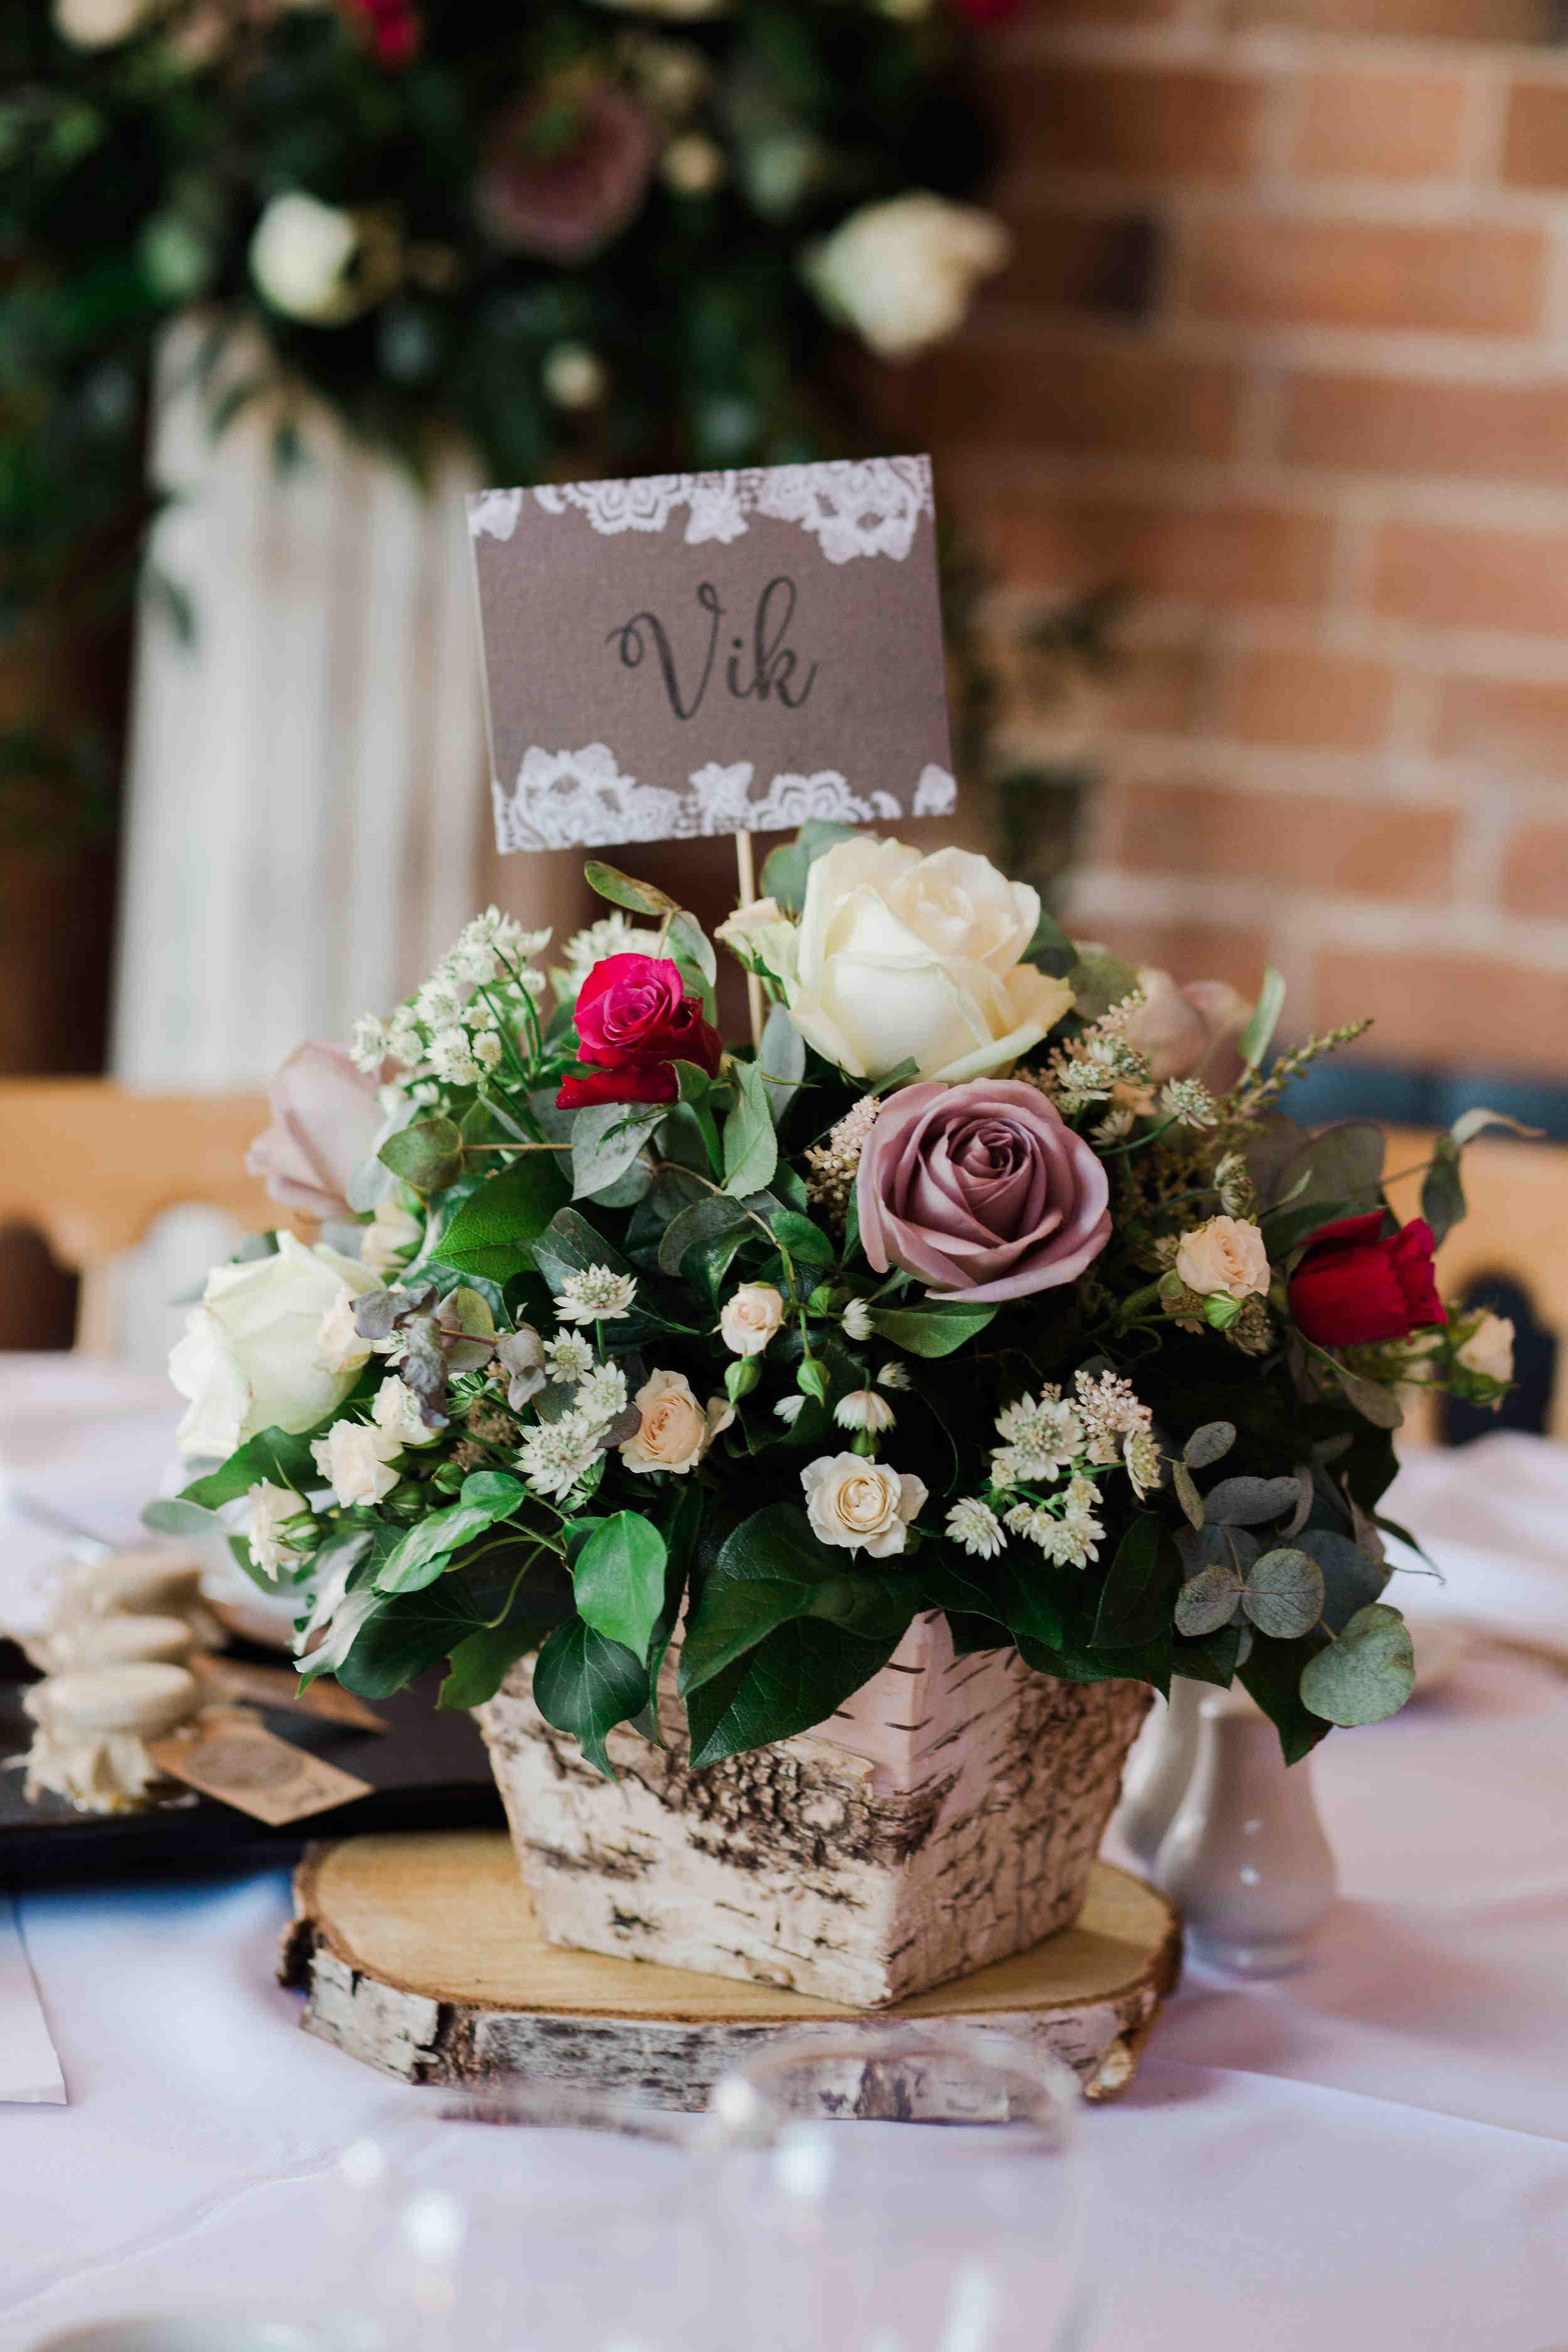 Modern_Stylish_Wedding_at_Swallows_Nest_Barn1235